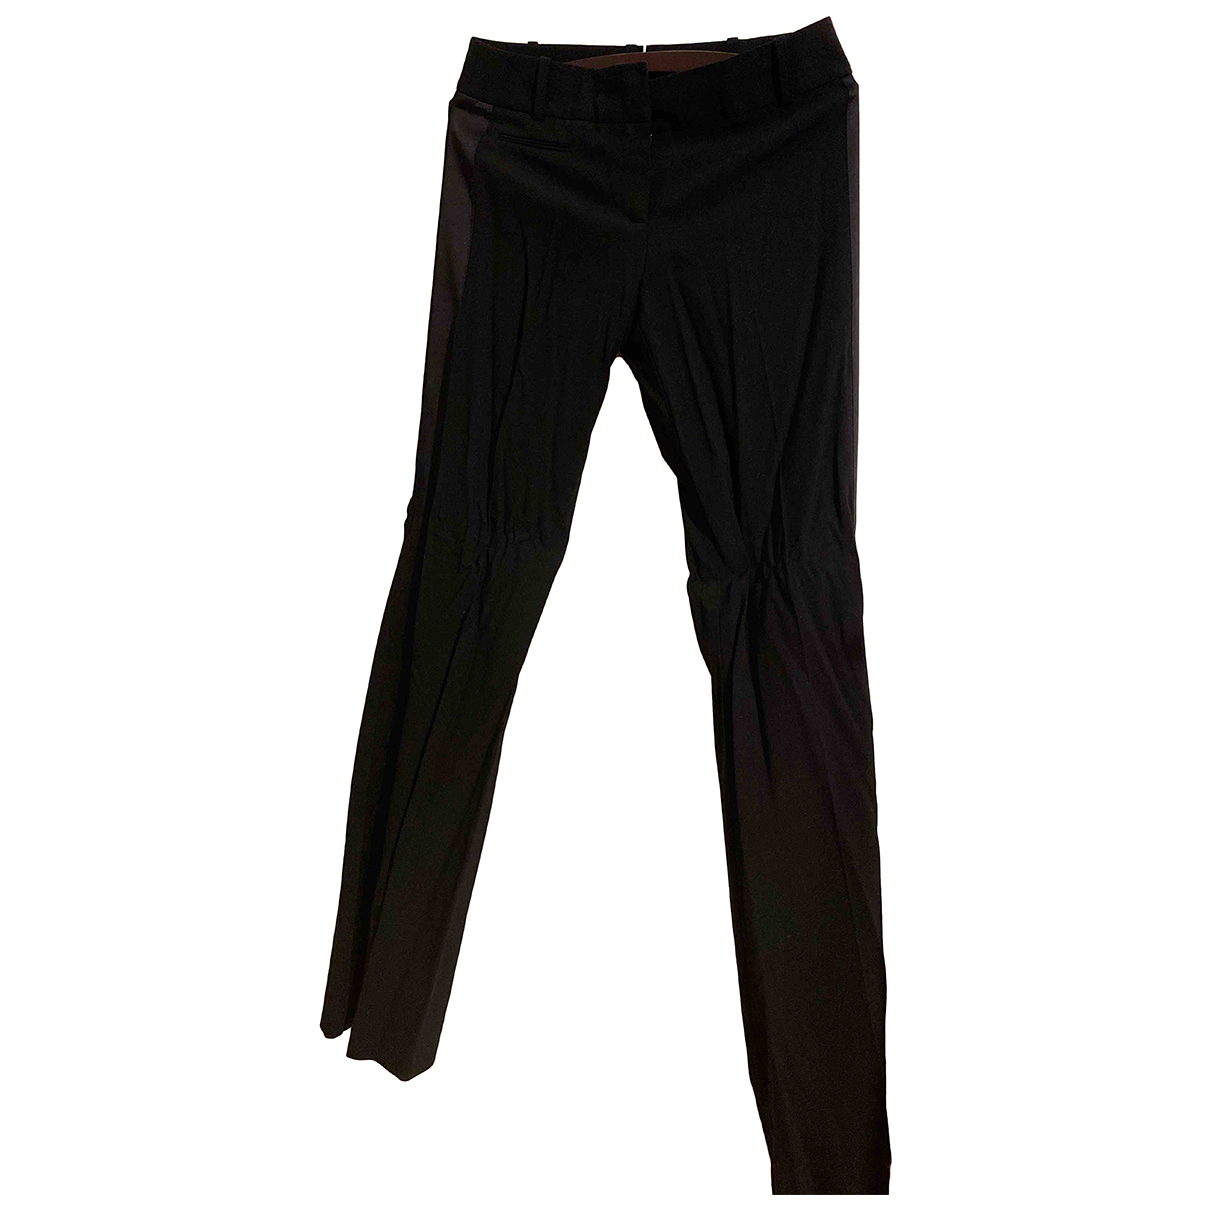 Bcbg Max Azria N Black Trousers for Women 2 US